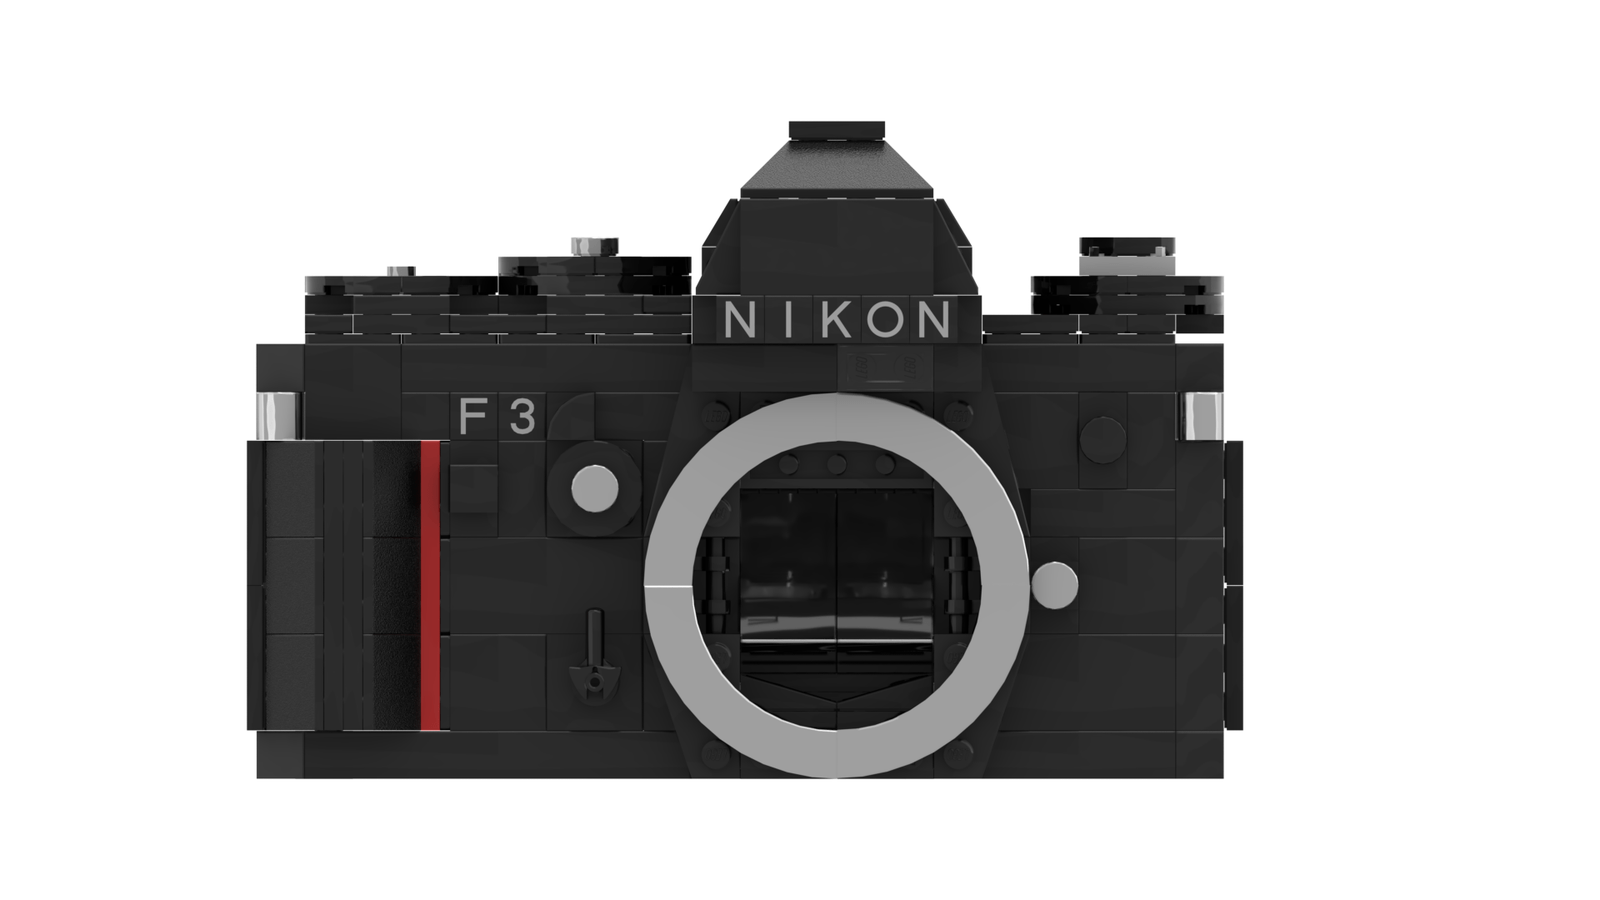 LEGO Nikon F3: Front (Credit: Ethan Brossard)